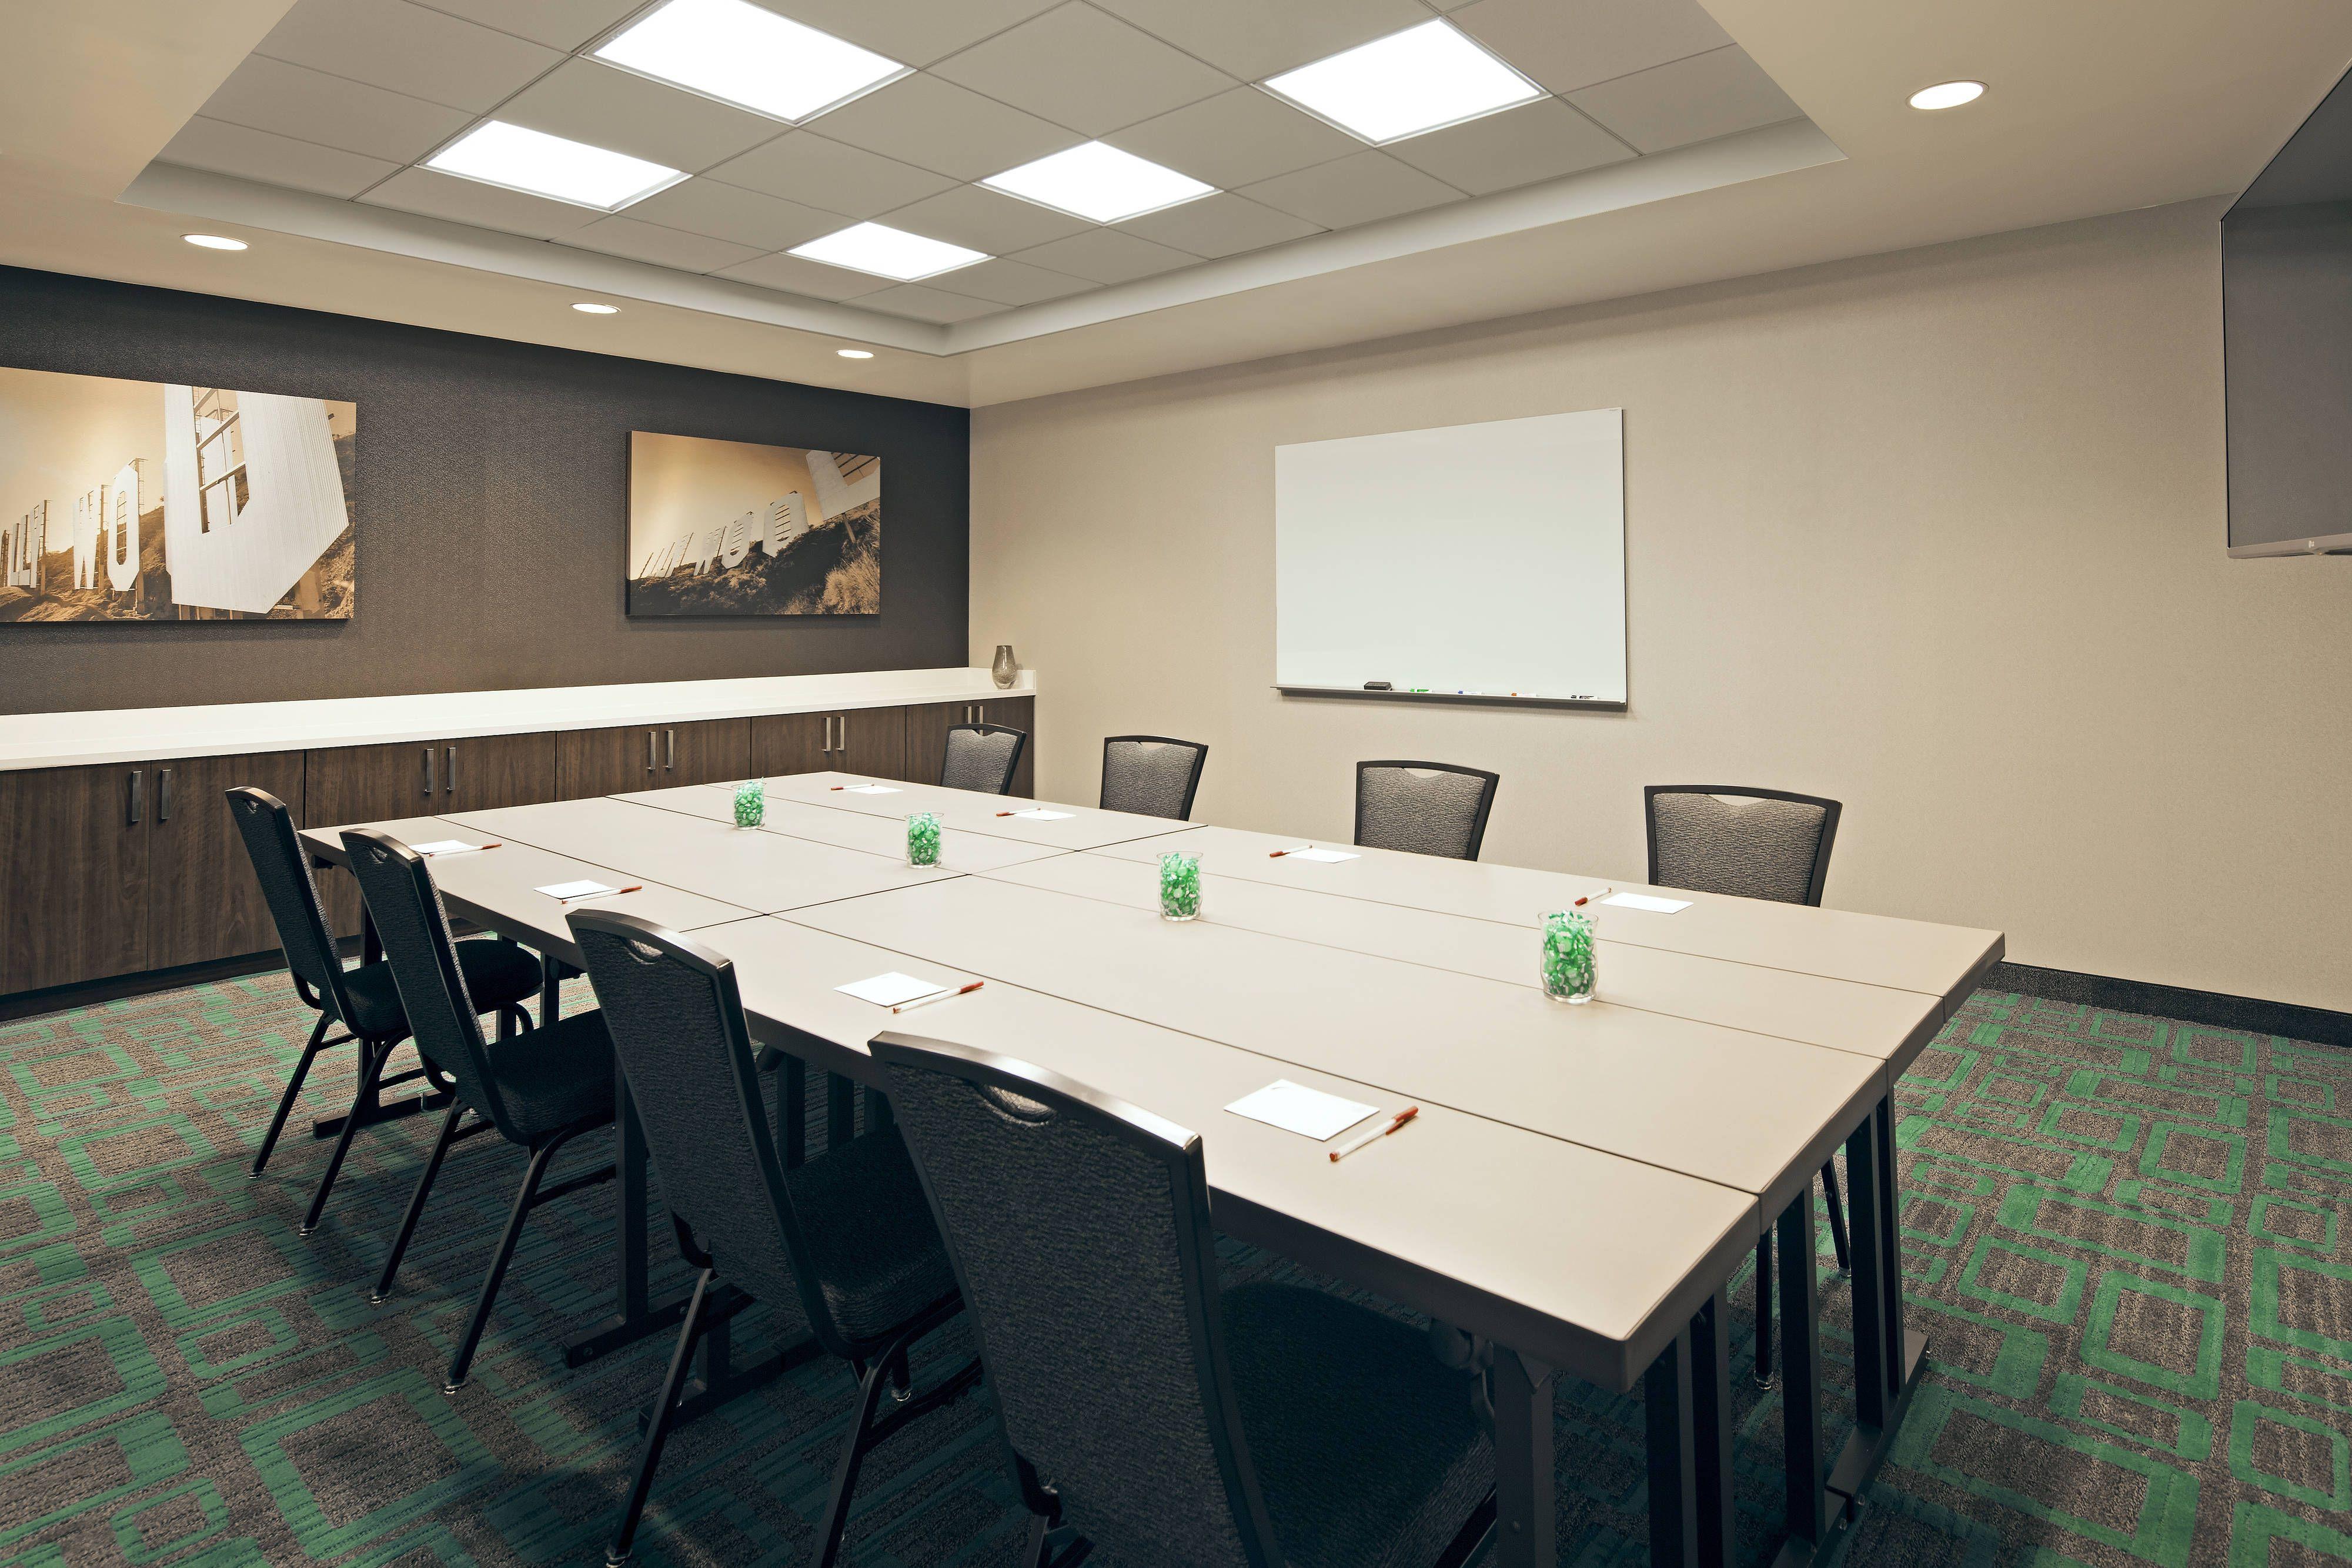 Residence Inn Los Angeles Lax Century Boulevard Meeting Room Boardroom Setup Hotels Relax Hotels Residences Hotel Suites Meeting Room